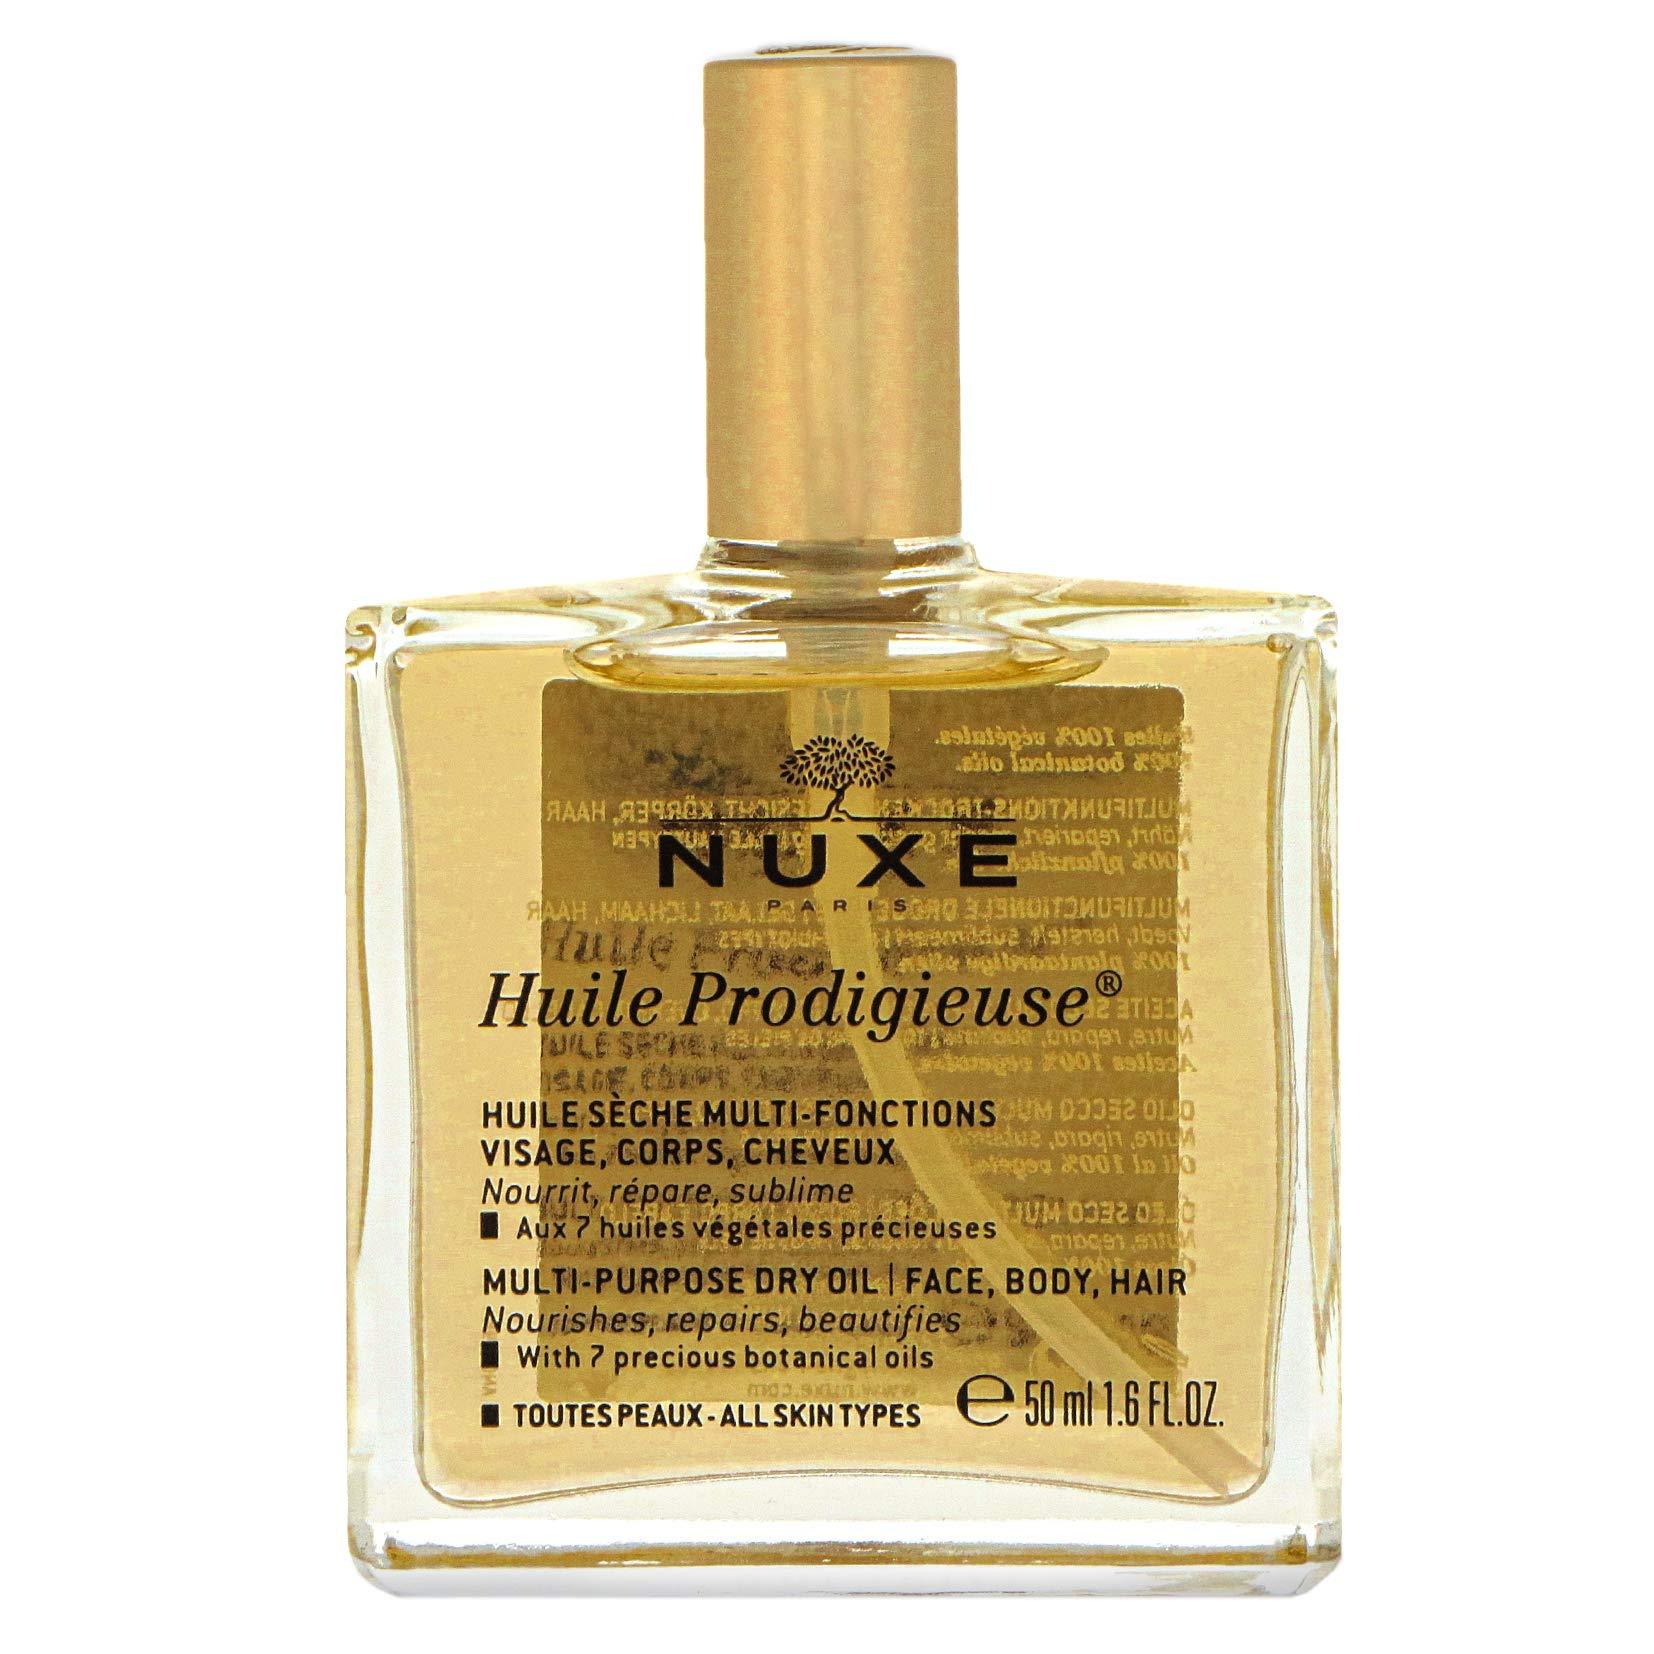 NUXE Body Oil Huile Prodigieuse, 50 ml